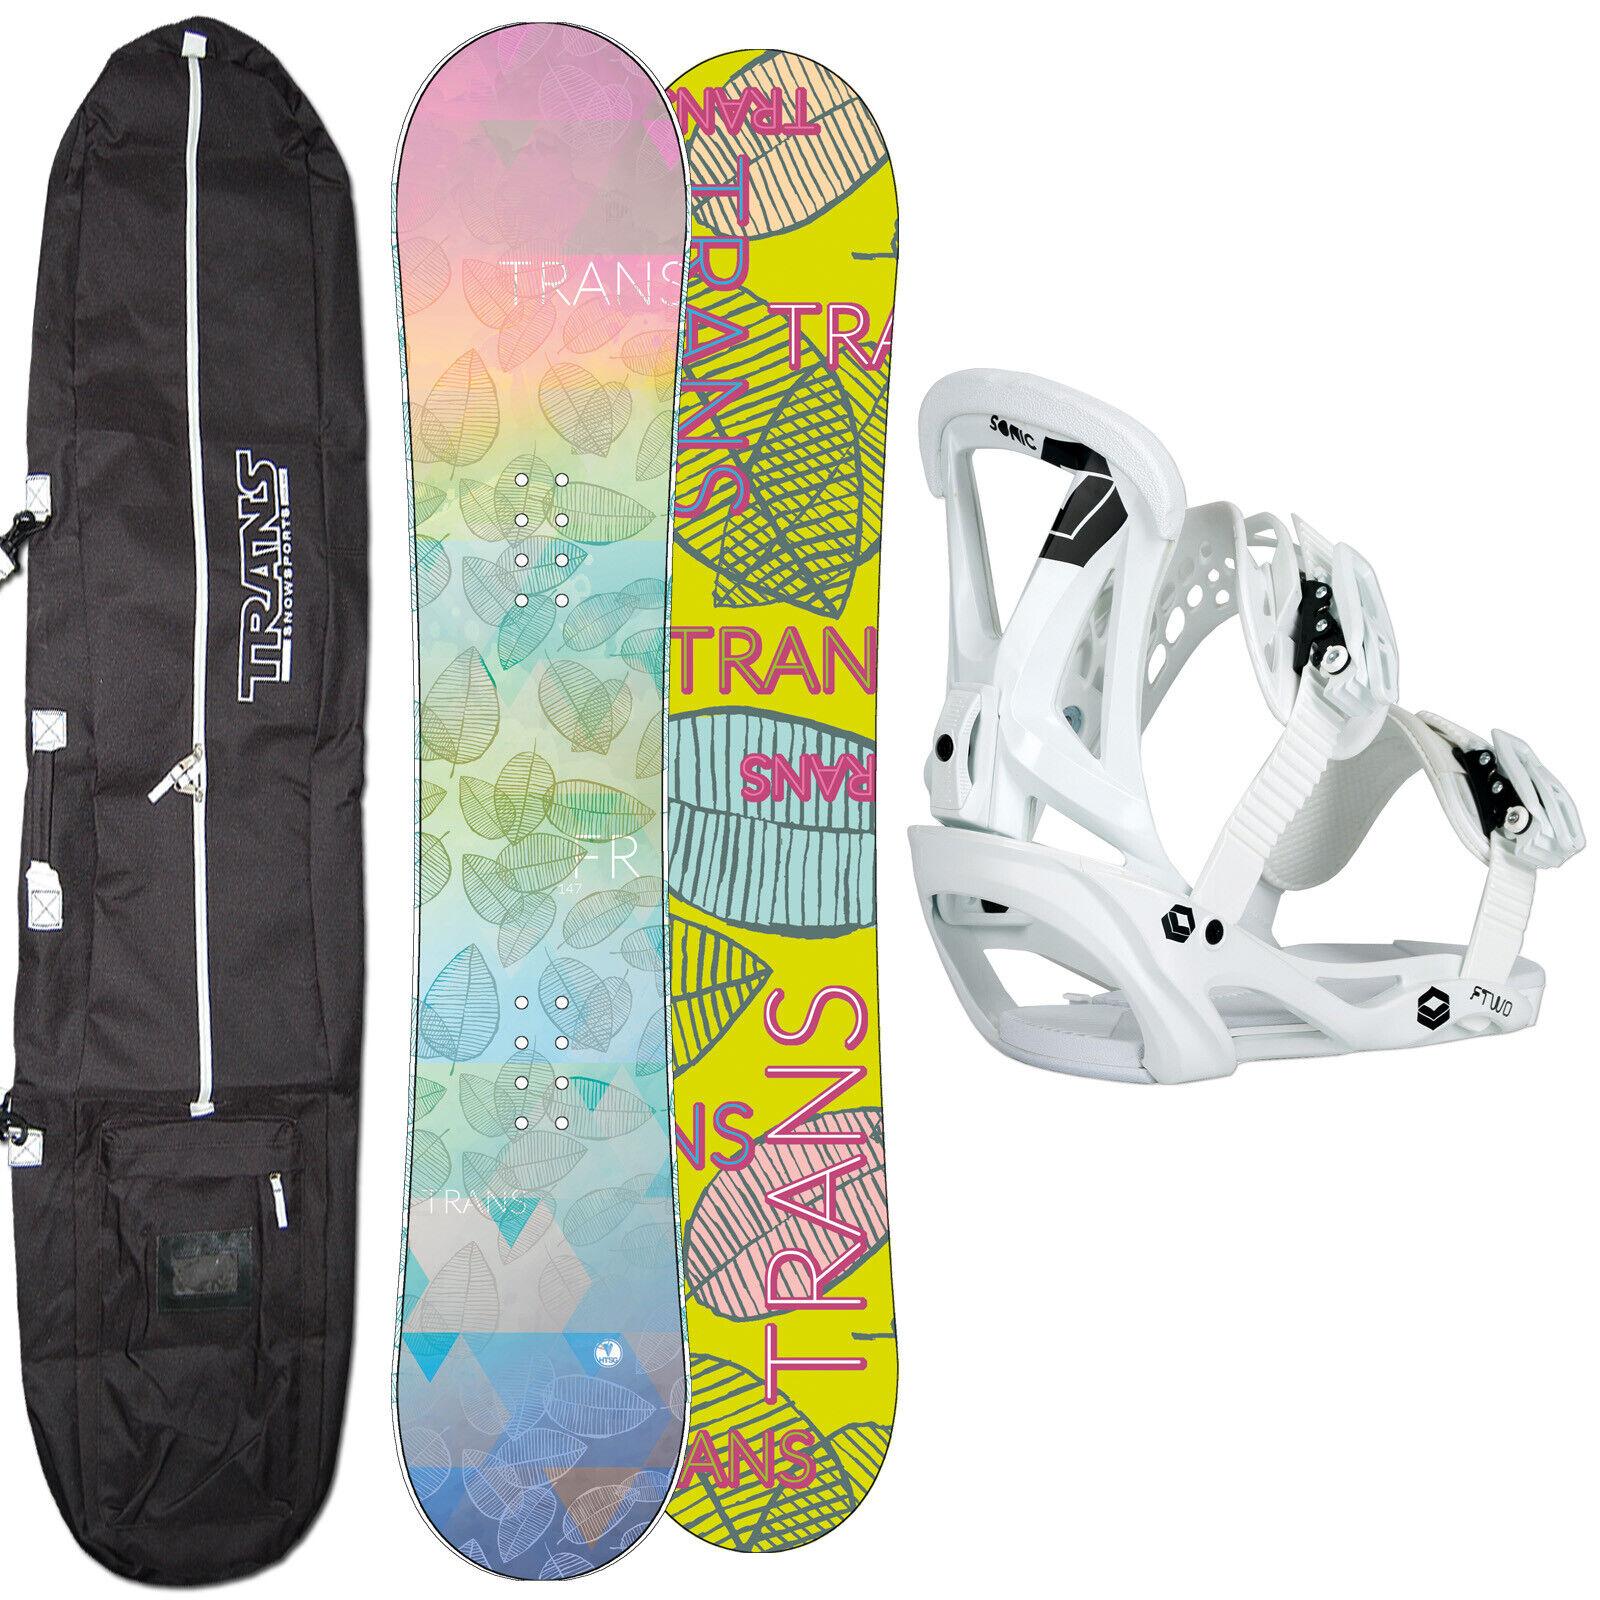 DAMEN SNOWBOARD SET TRANS FR 143 CM 2020 + FTWO SONIC BINDUNG GR. M + BAG